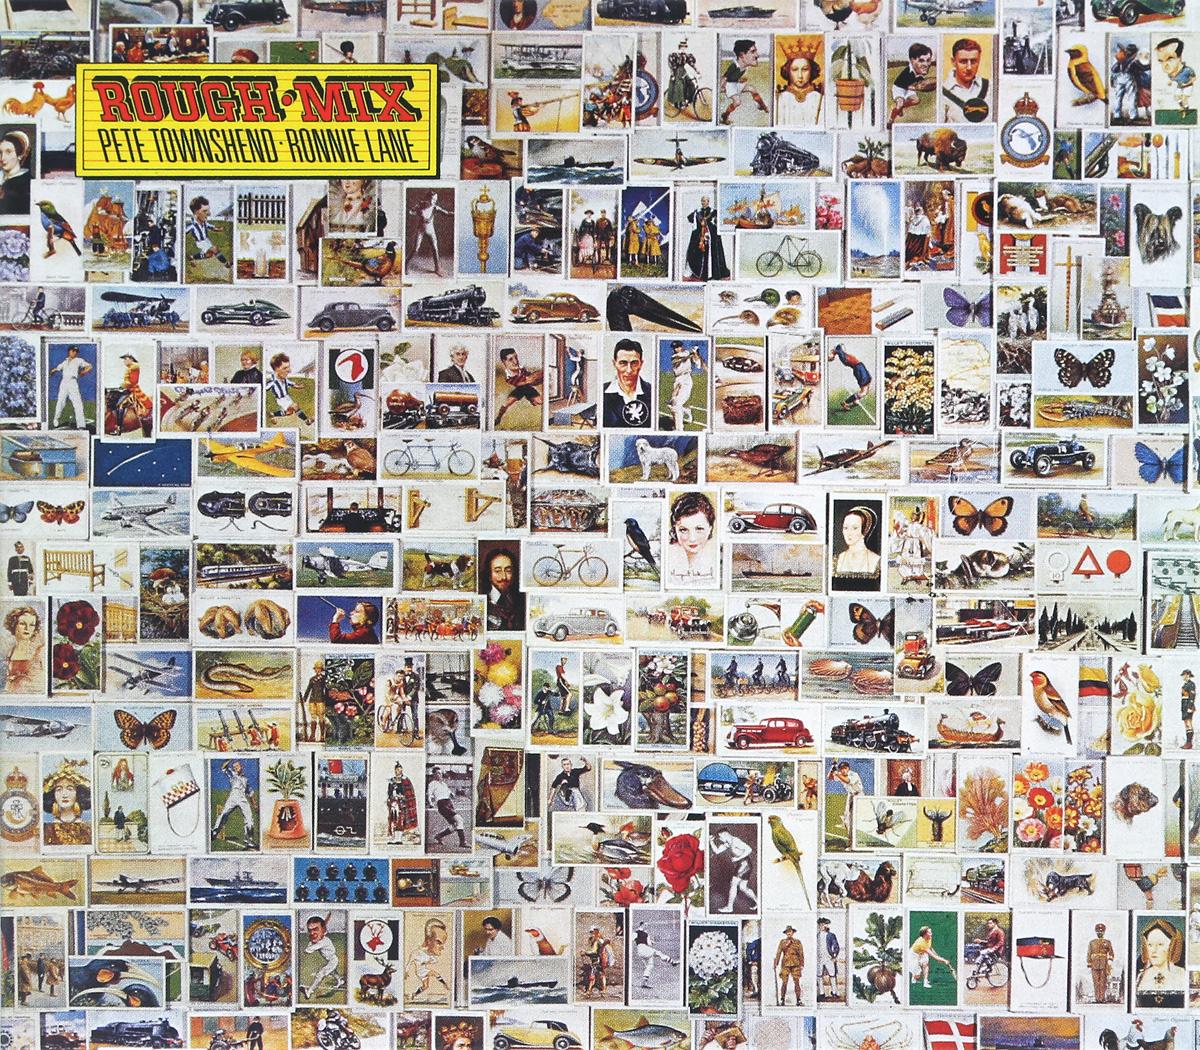 Пит Тауншенд,Ронни Лейн Pete Townshend & Ronnie Lane. Rough Mix цена и фото